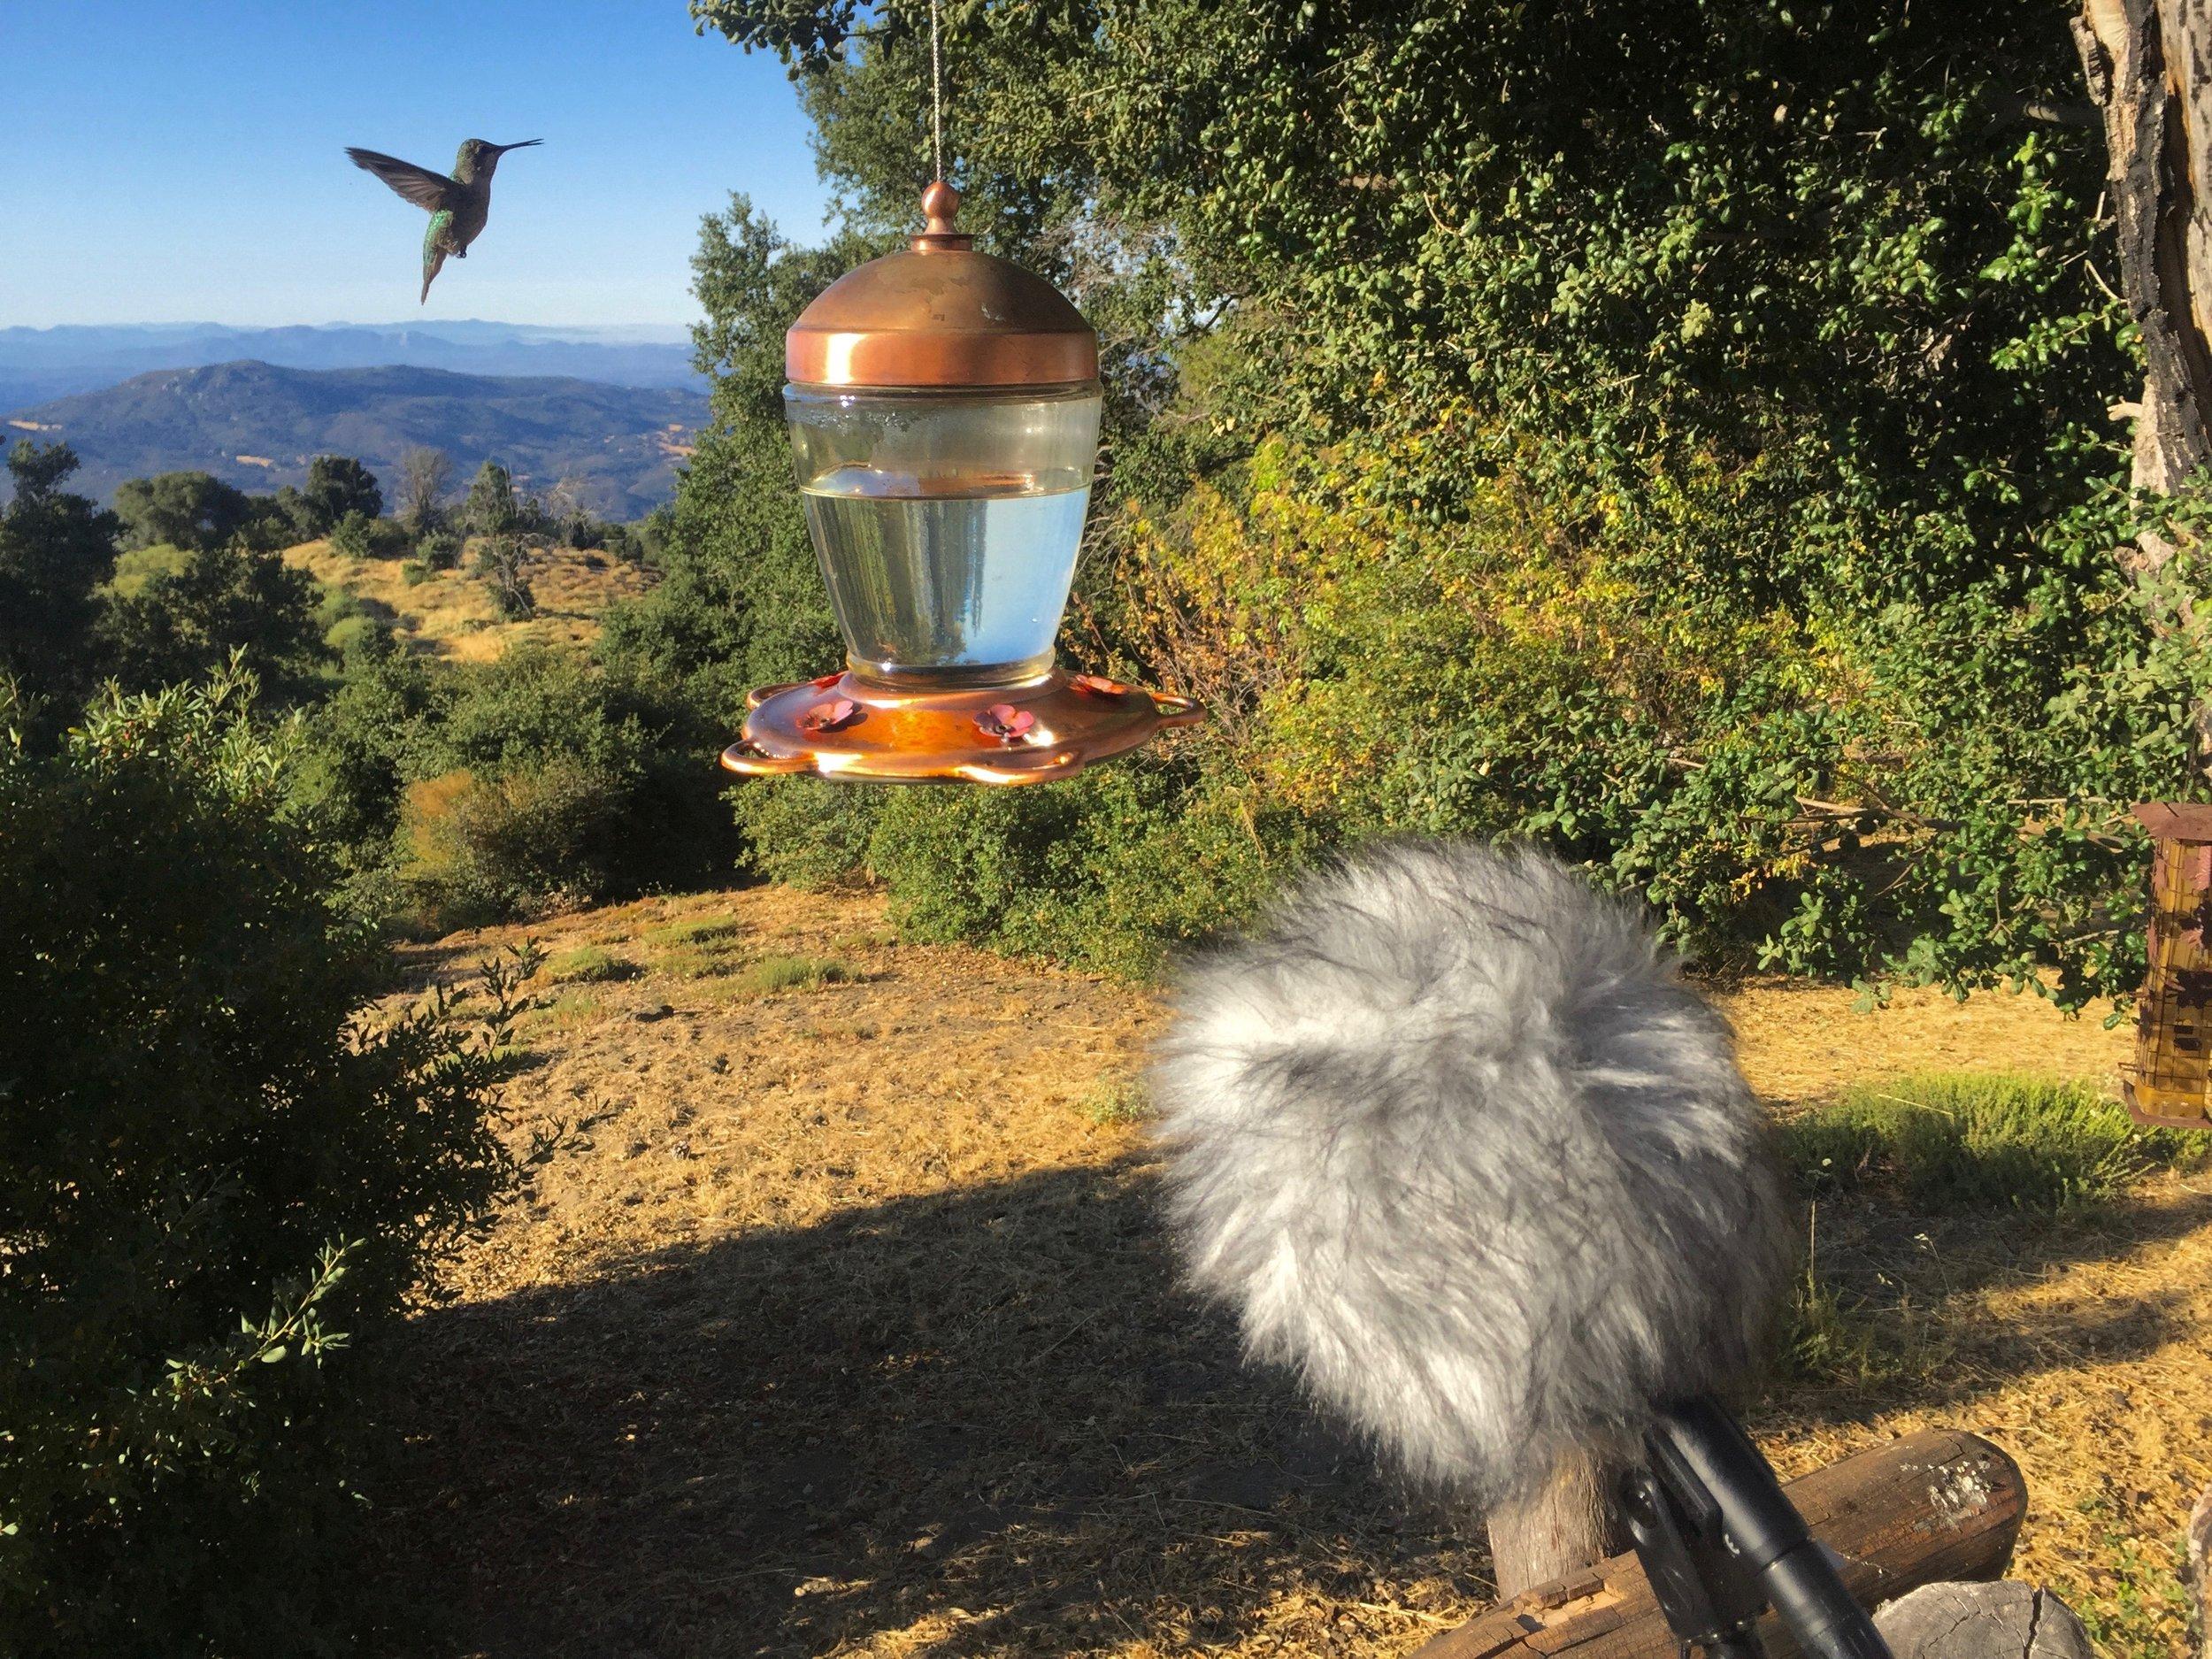 Hummingbirds_Palomar Mountain_AT4025.jpg